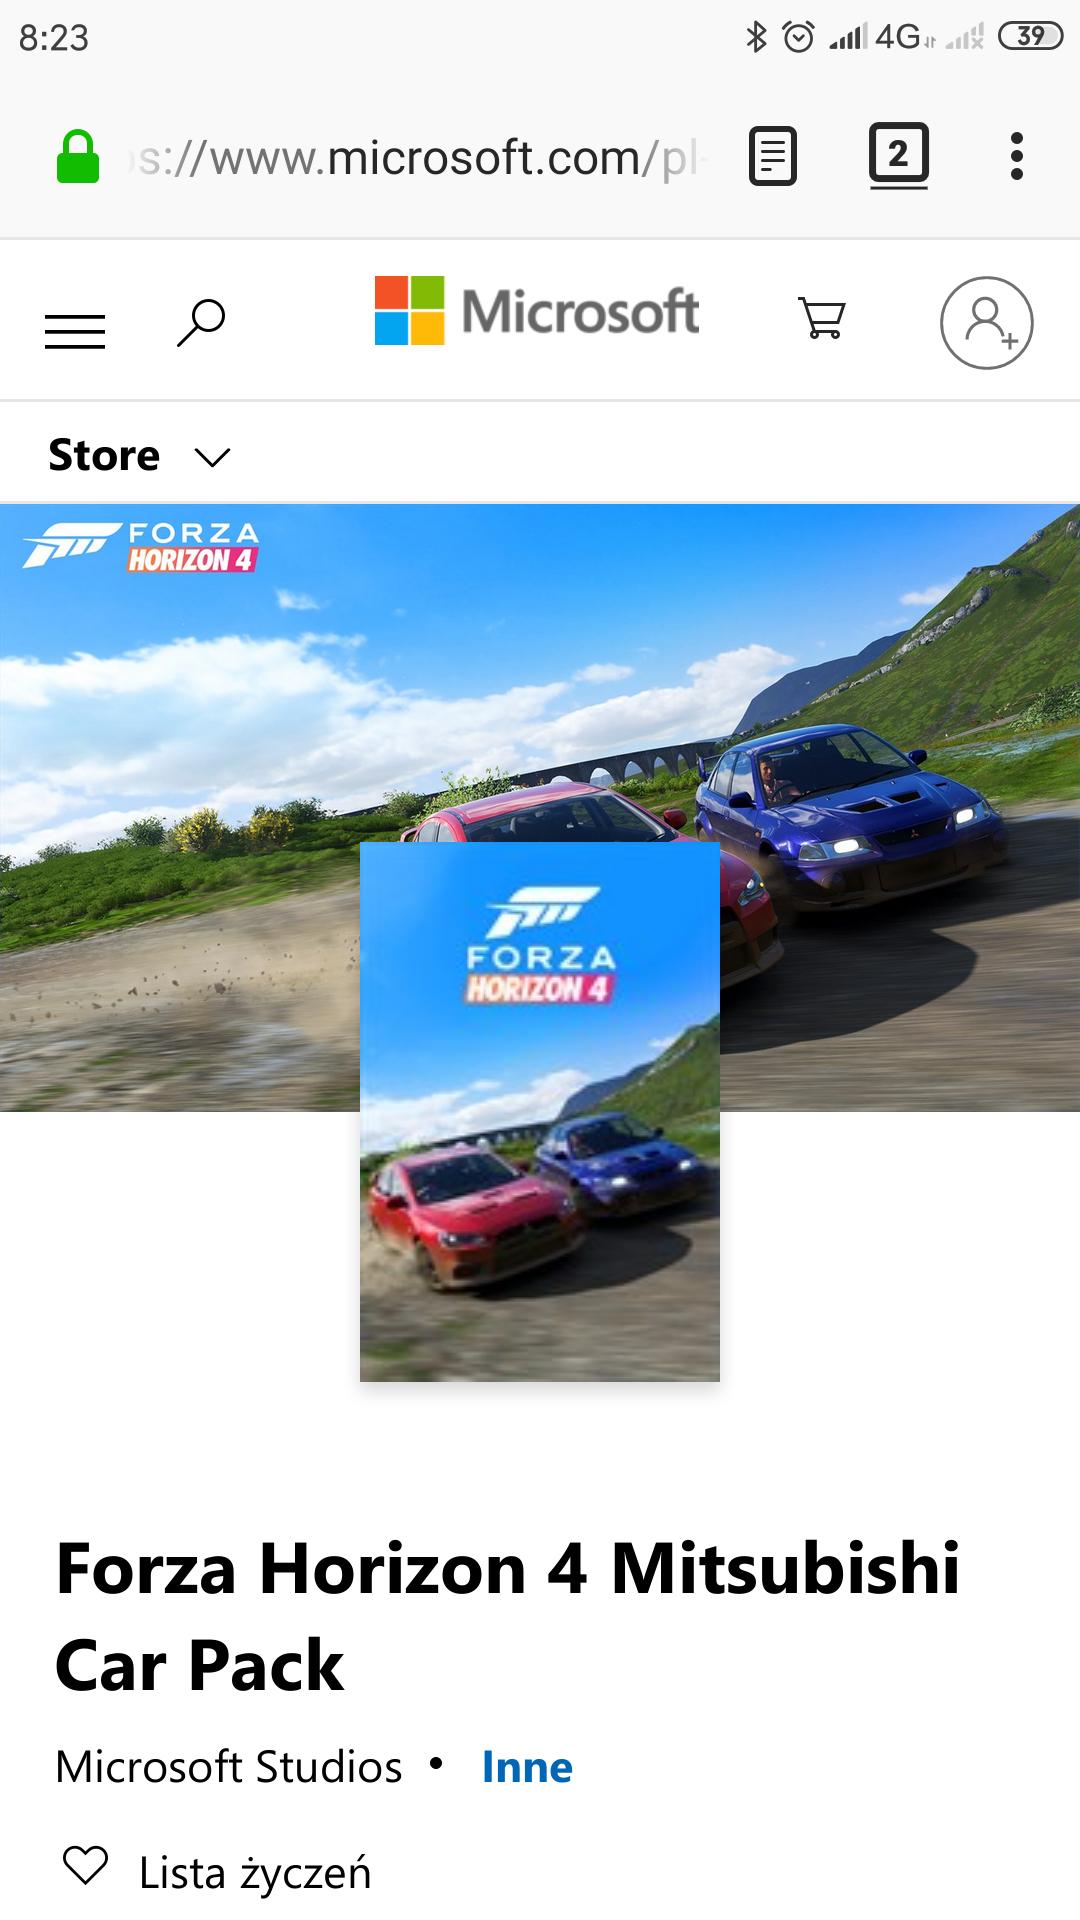 Forza Horizon 4 Mitsubishi Car Pack ( za darmo)